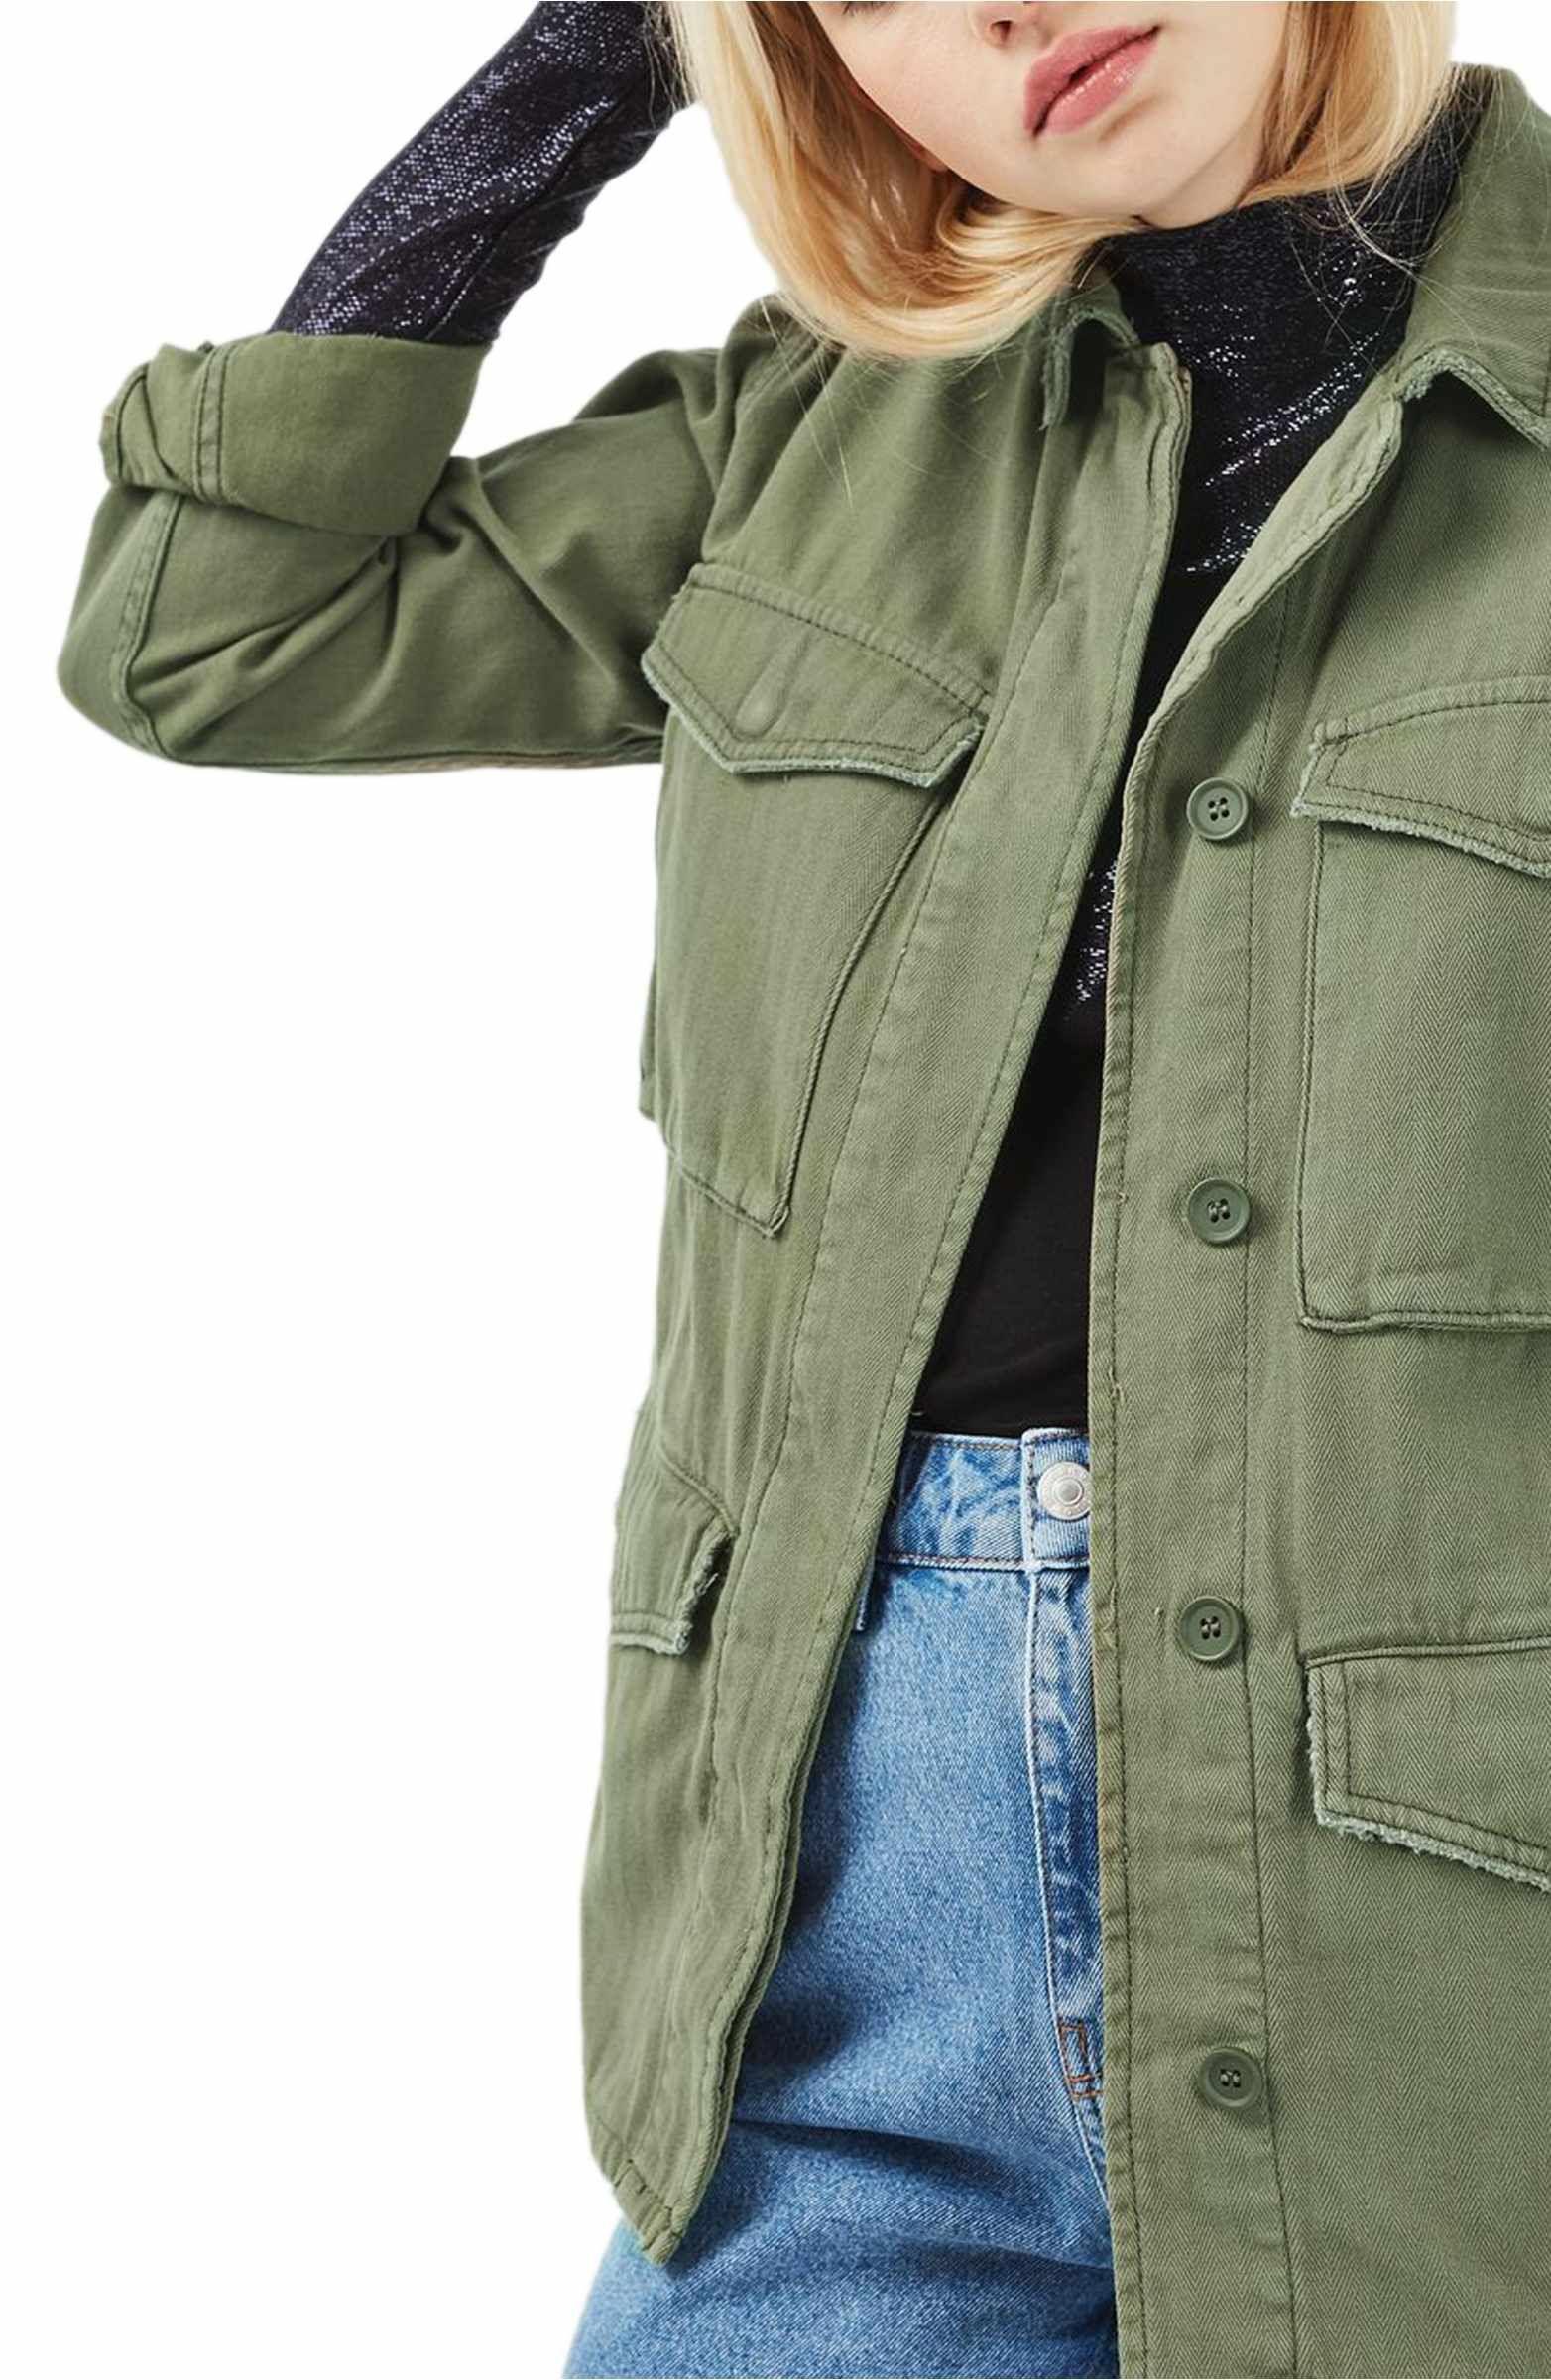 Topshop Ethan Shirt Jacket Nordstrom Topshop Outfit Olive Military Jacket Jackets [ 2400 x 1564 Pixel ]